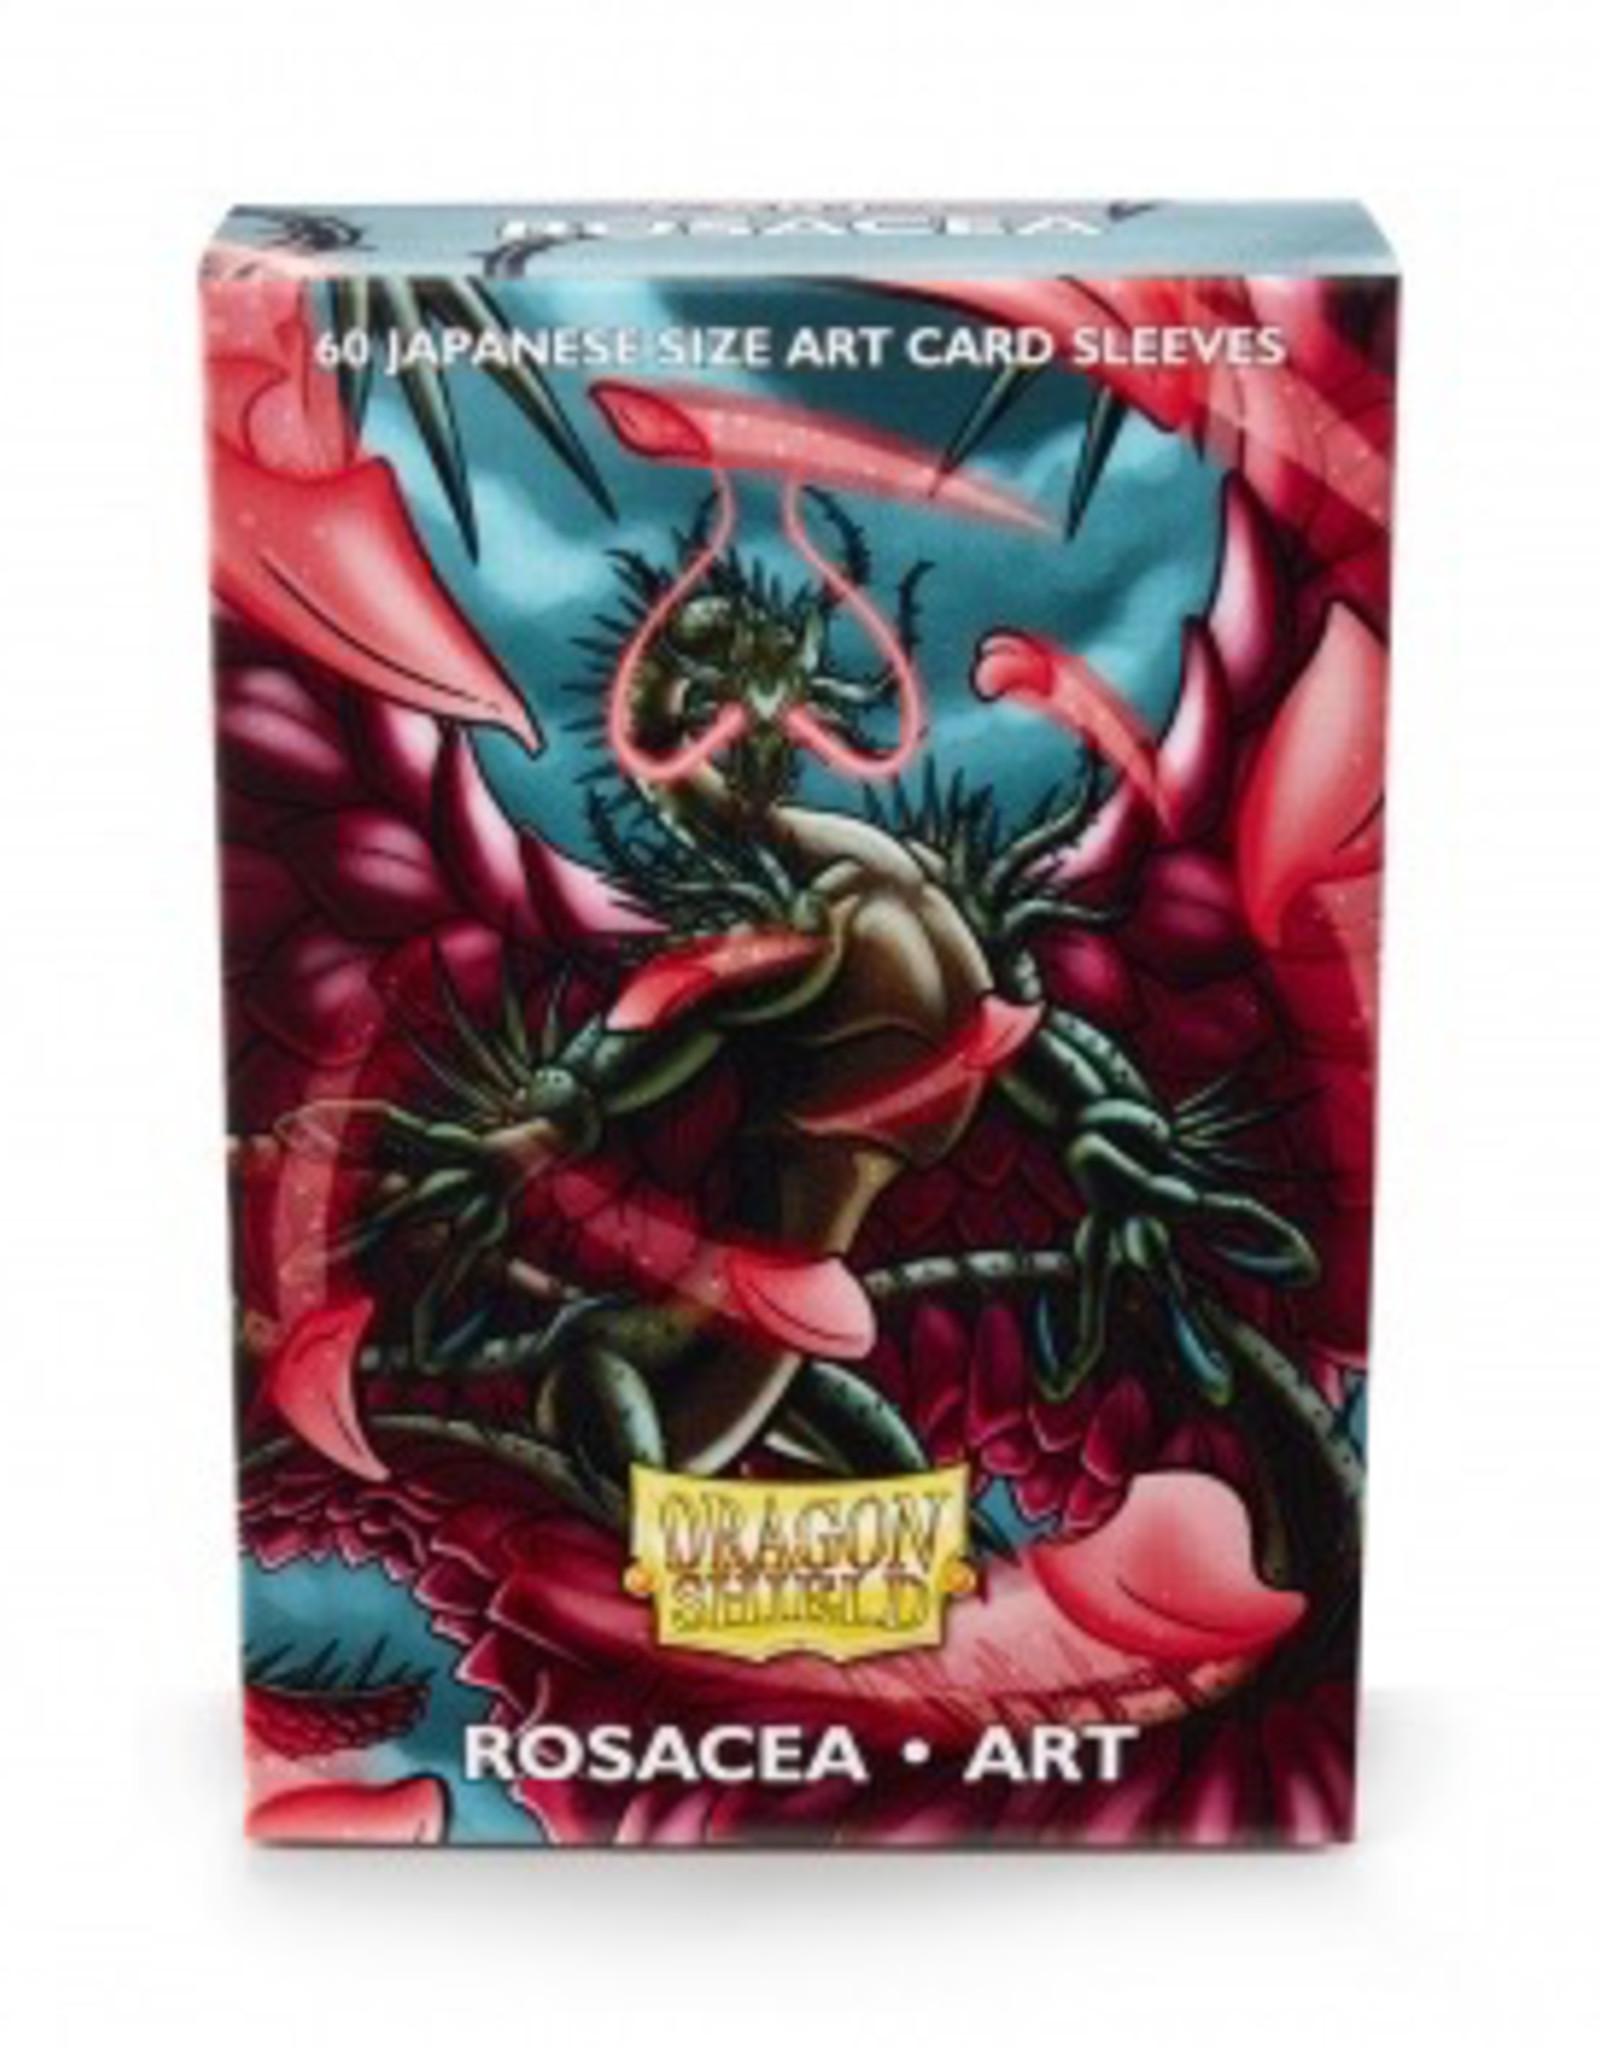 DS - Small Sleeves Dragon Shield Japanese Art Sleeves - Rosacea (60 Sleeves)